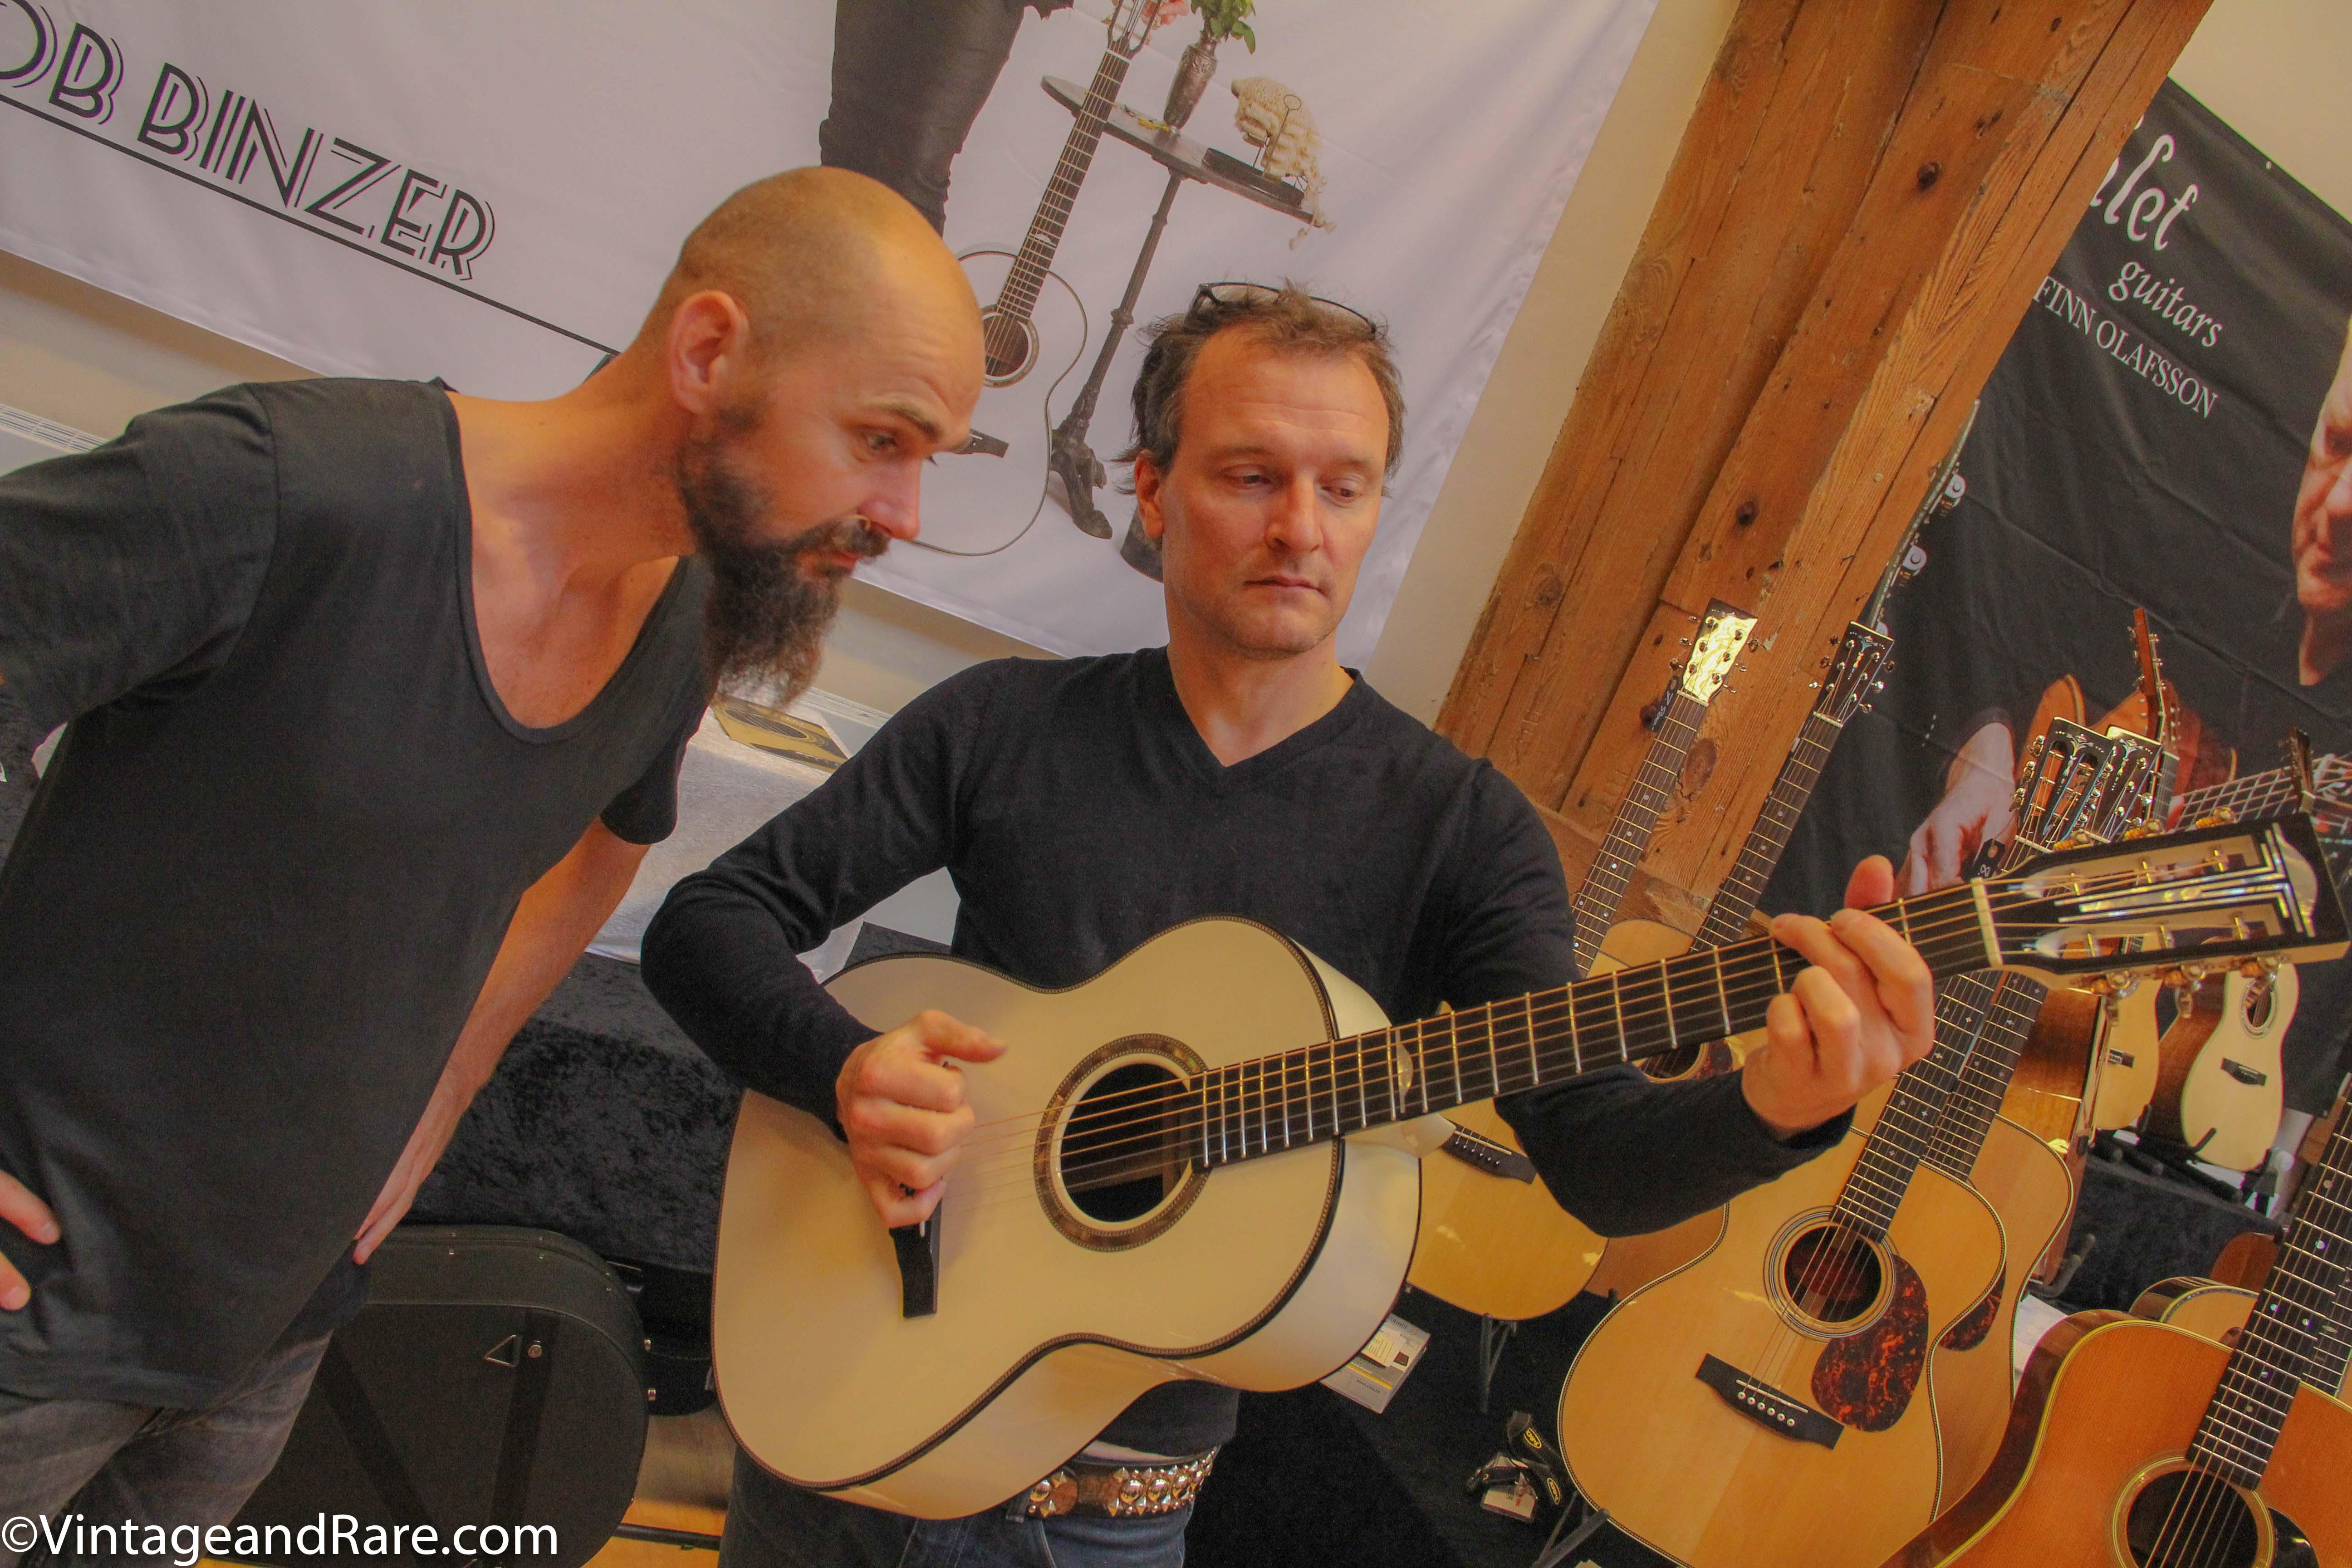 copenhagen guitar bass show 11 vintage rare blog. Black Bedroom Furniture Sets. Home Design Ideas